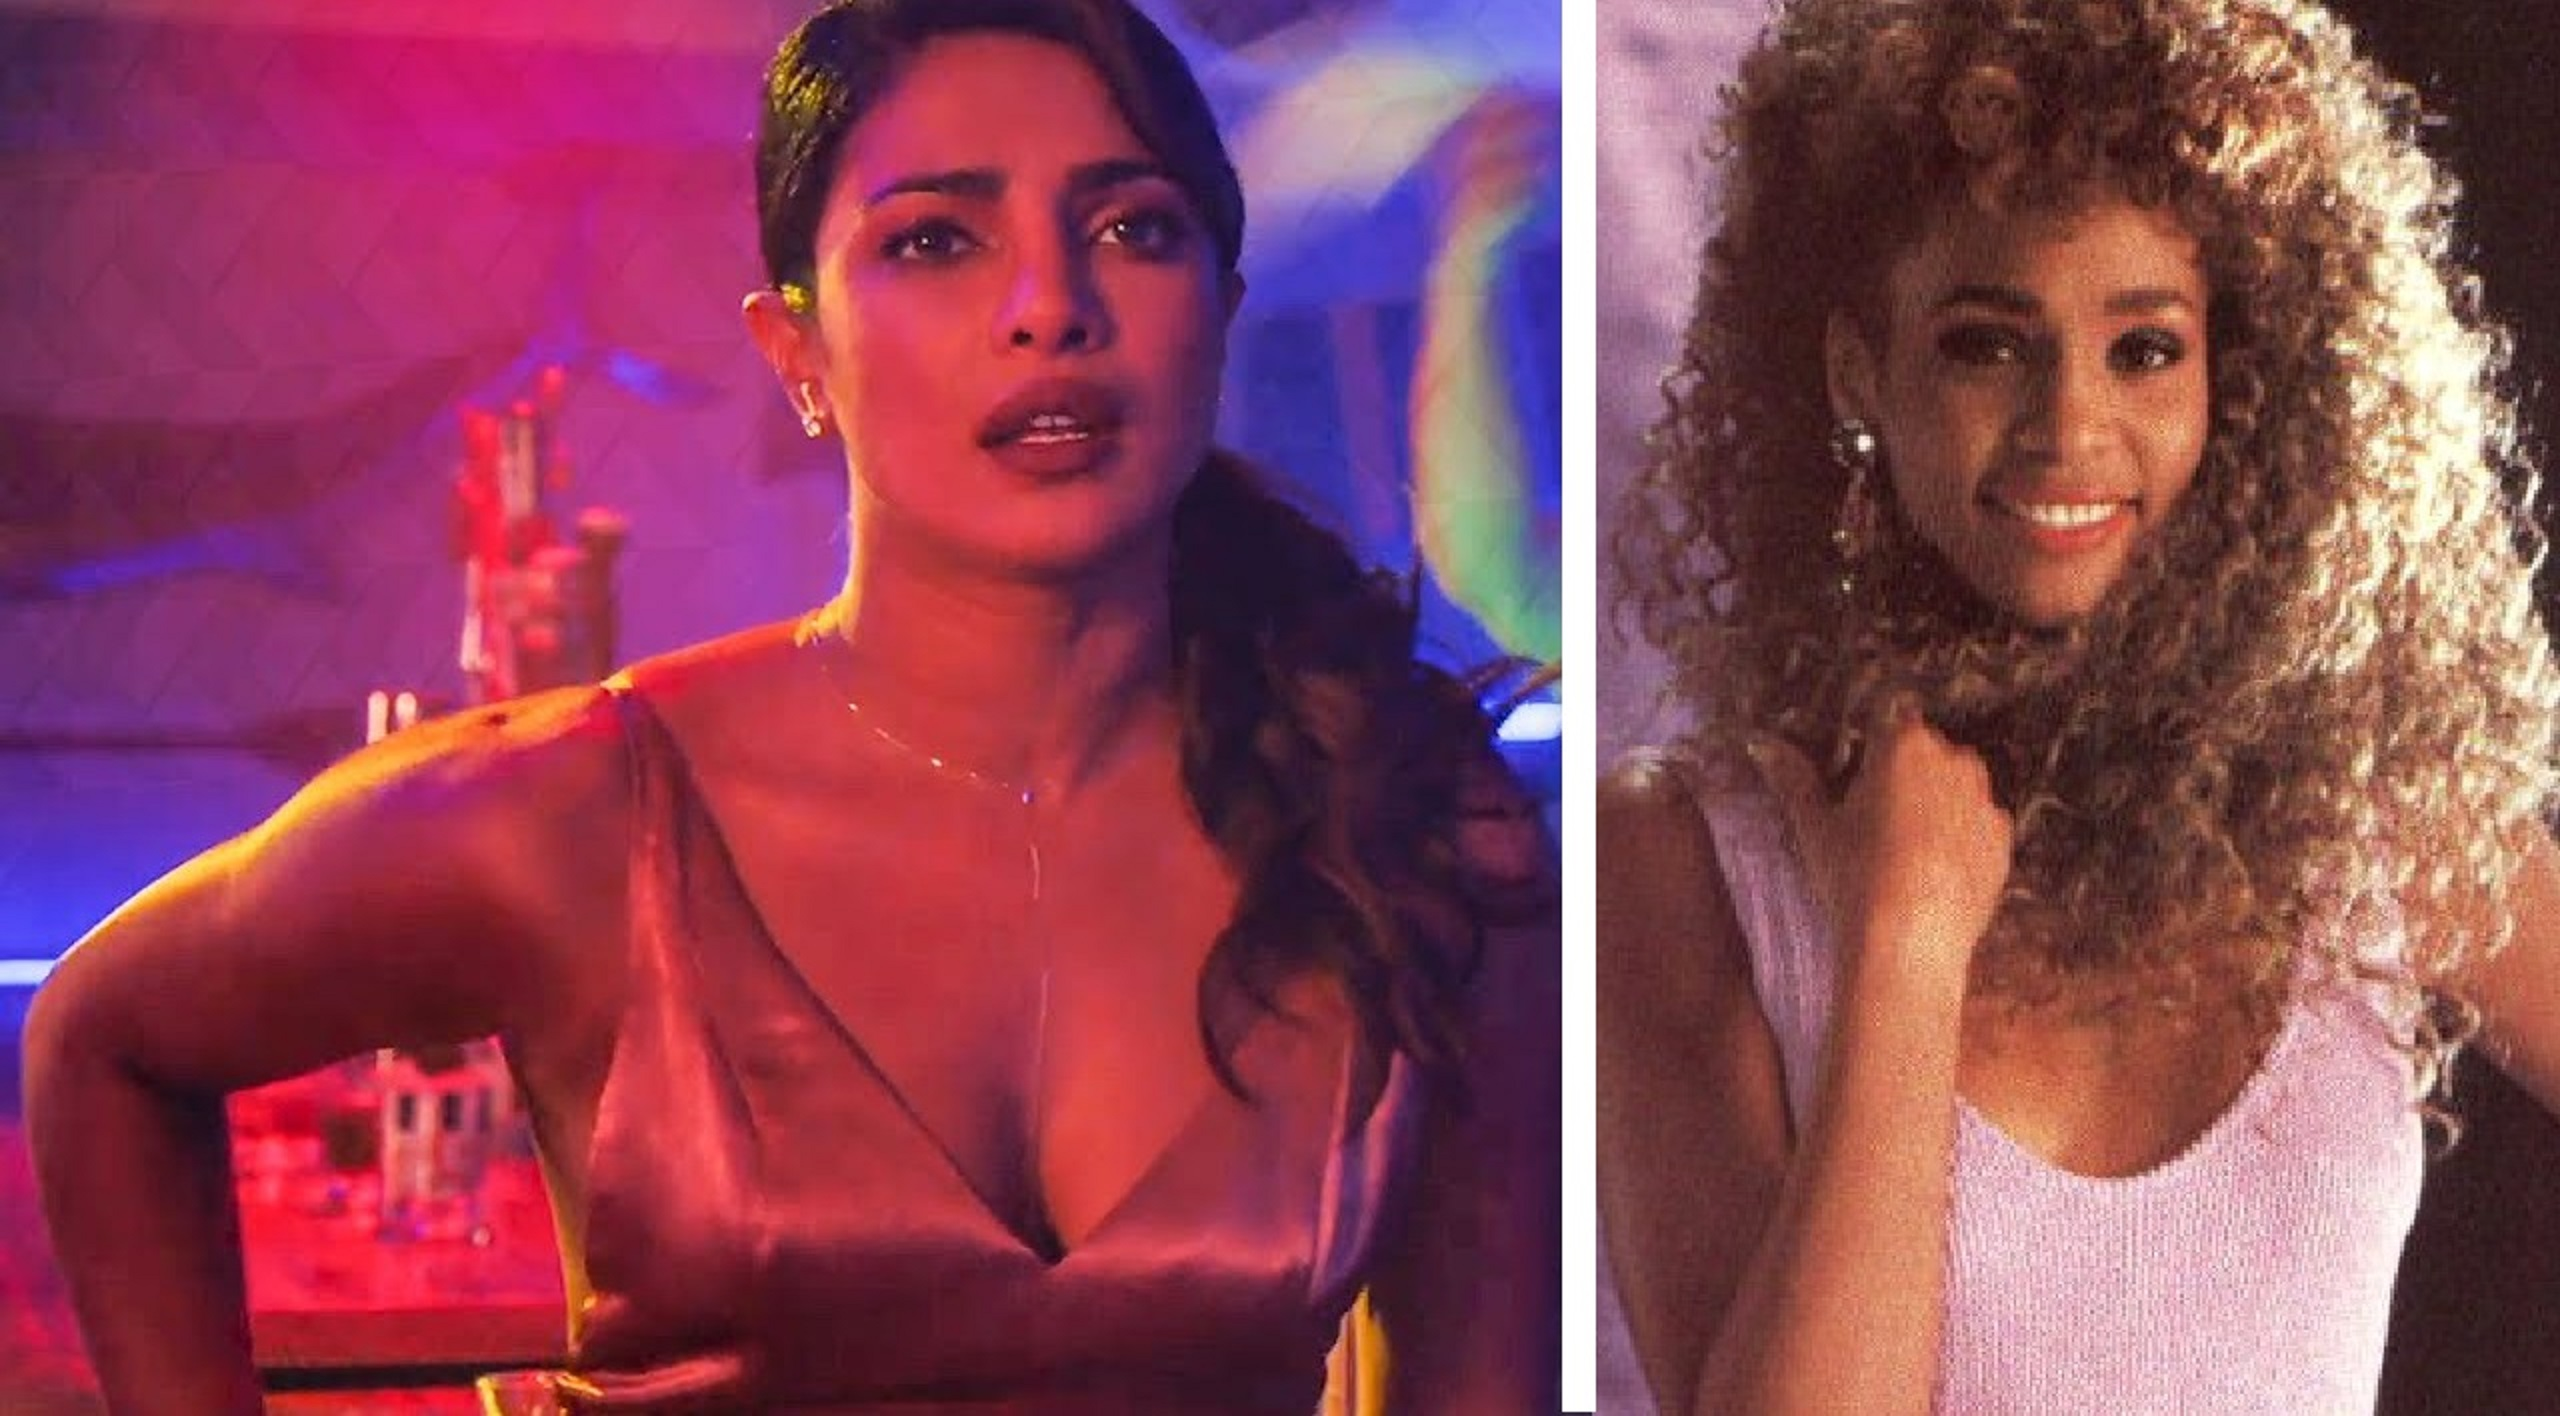 Watch: Priyanka Chopra and Rebel Wilson Dance-Off to Whitney Houston in Eccentric Karaoke Scene from 'Isn't It Romantic'